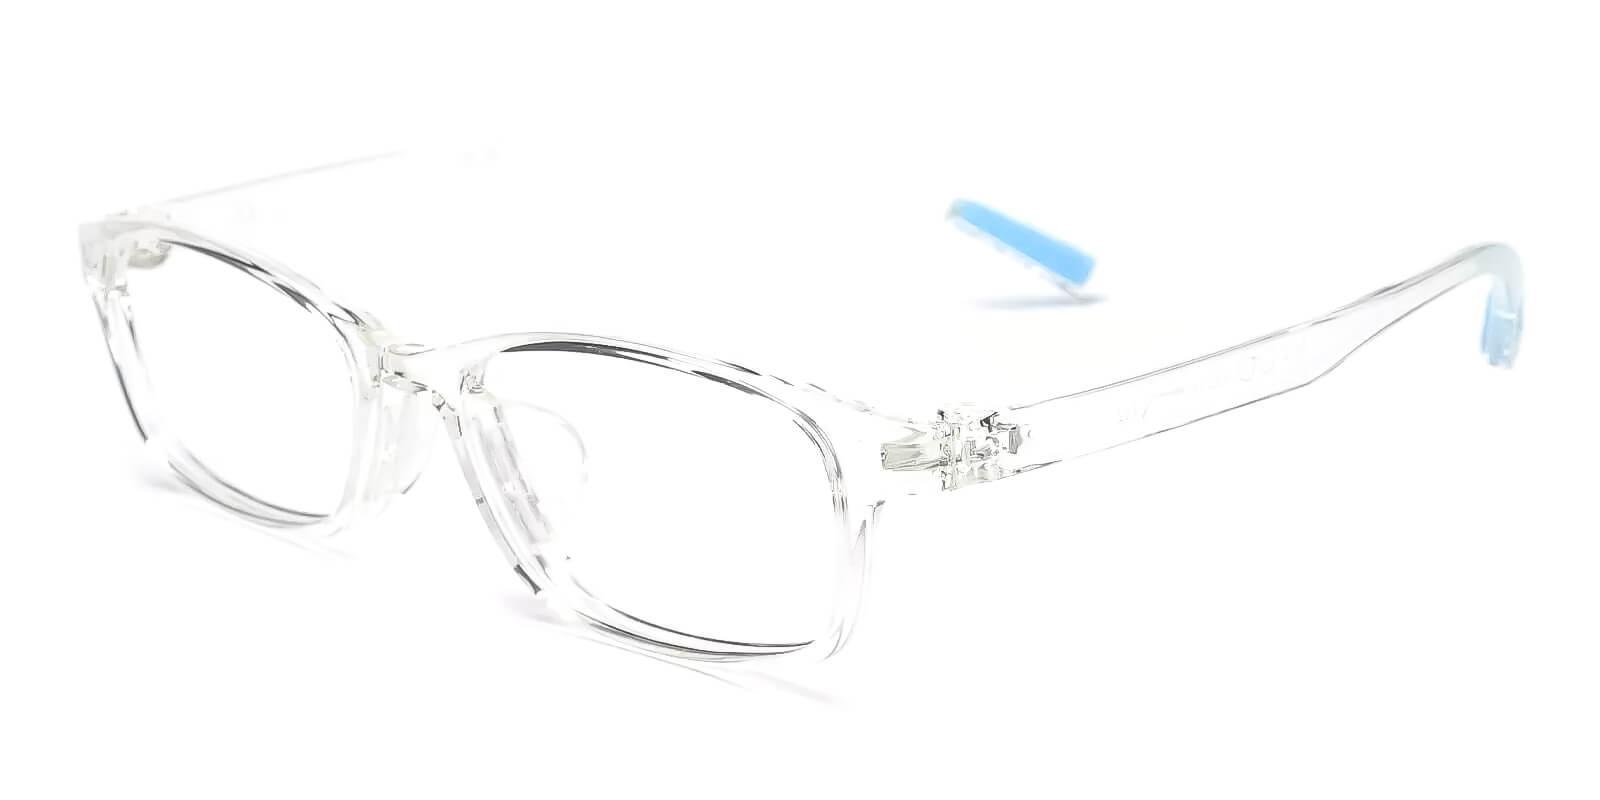 Kids-Metaphor Translucent TR Eyeglasses , Fashion , UniversalBridgeFit Frames from ABBE Glasses